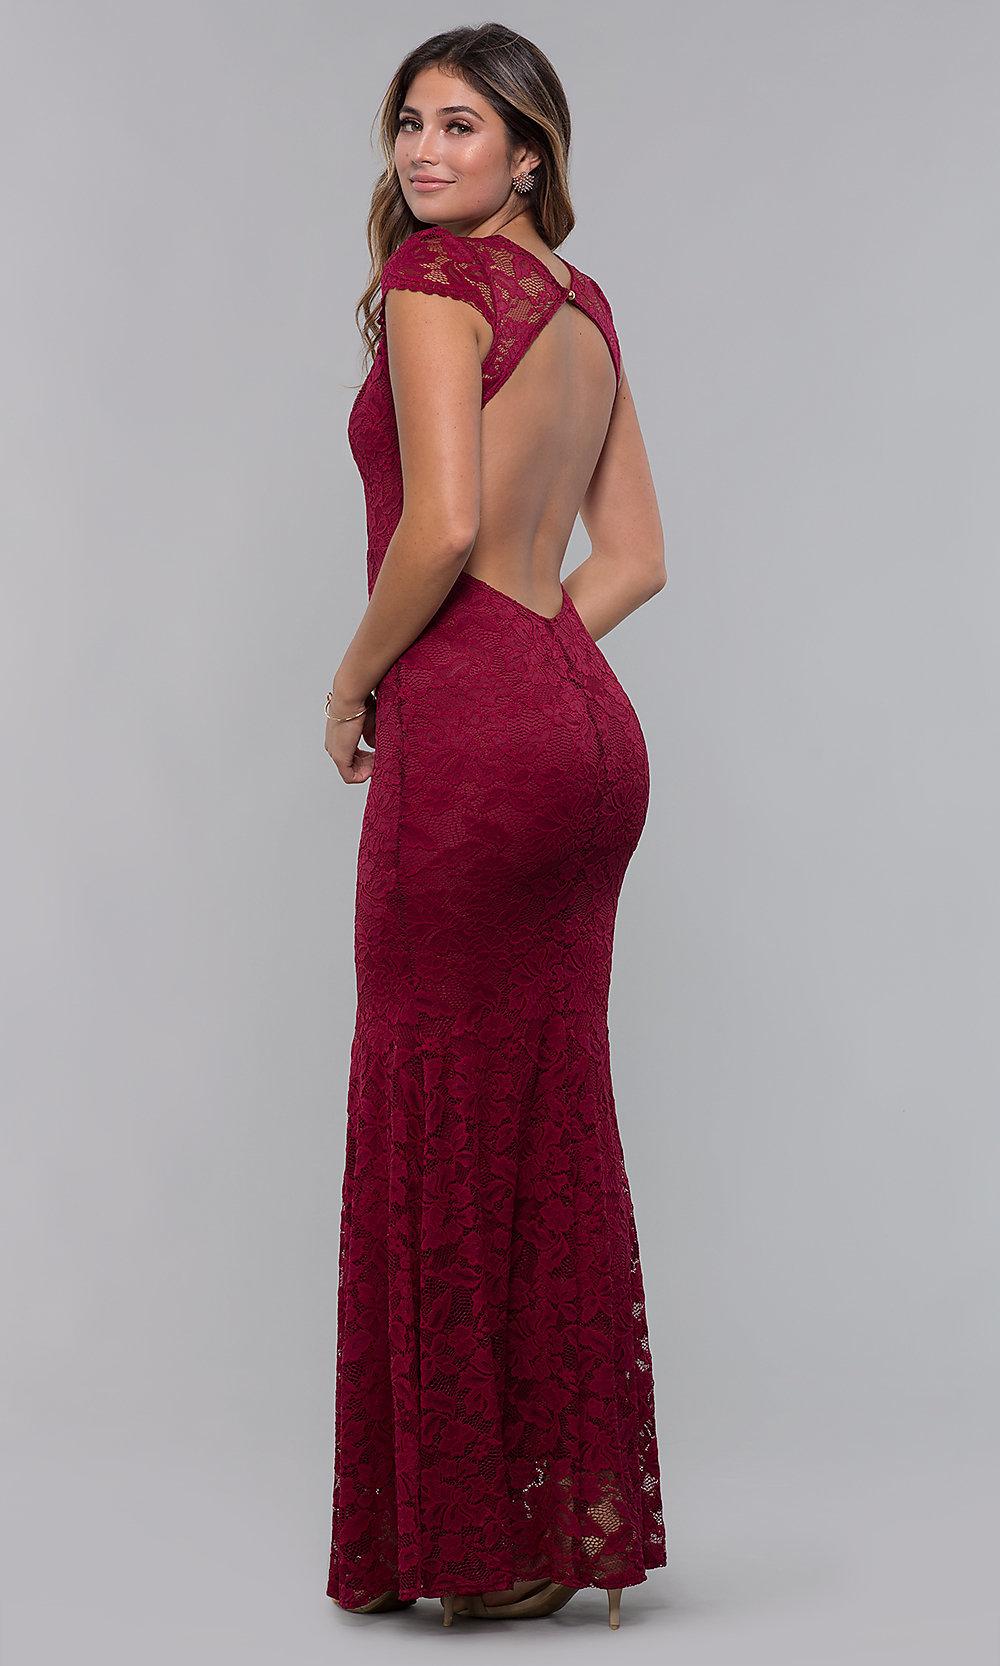 Long open back V-neck red prom dress back-side